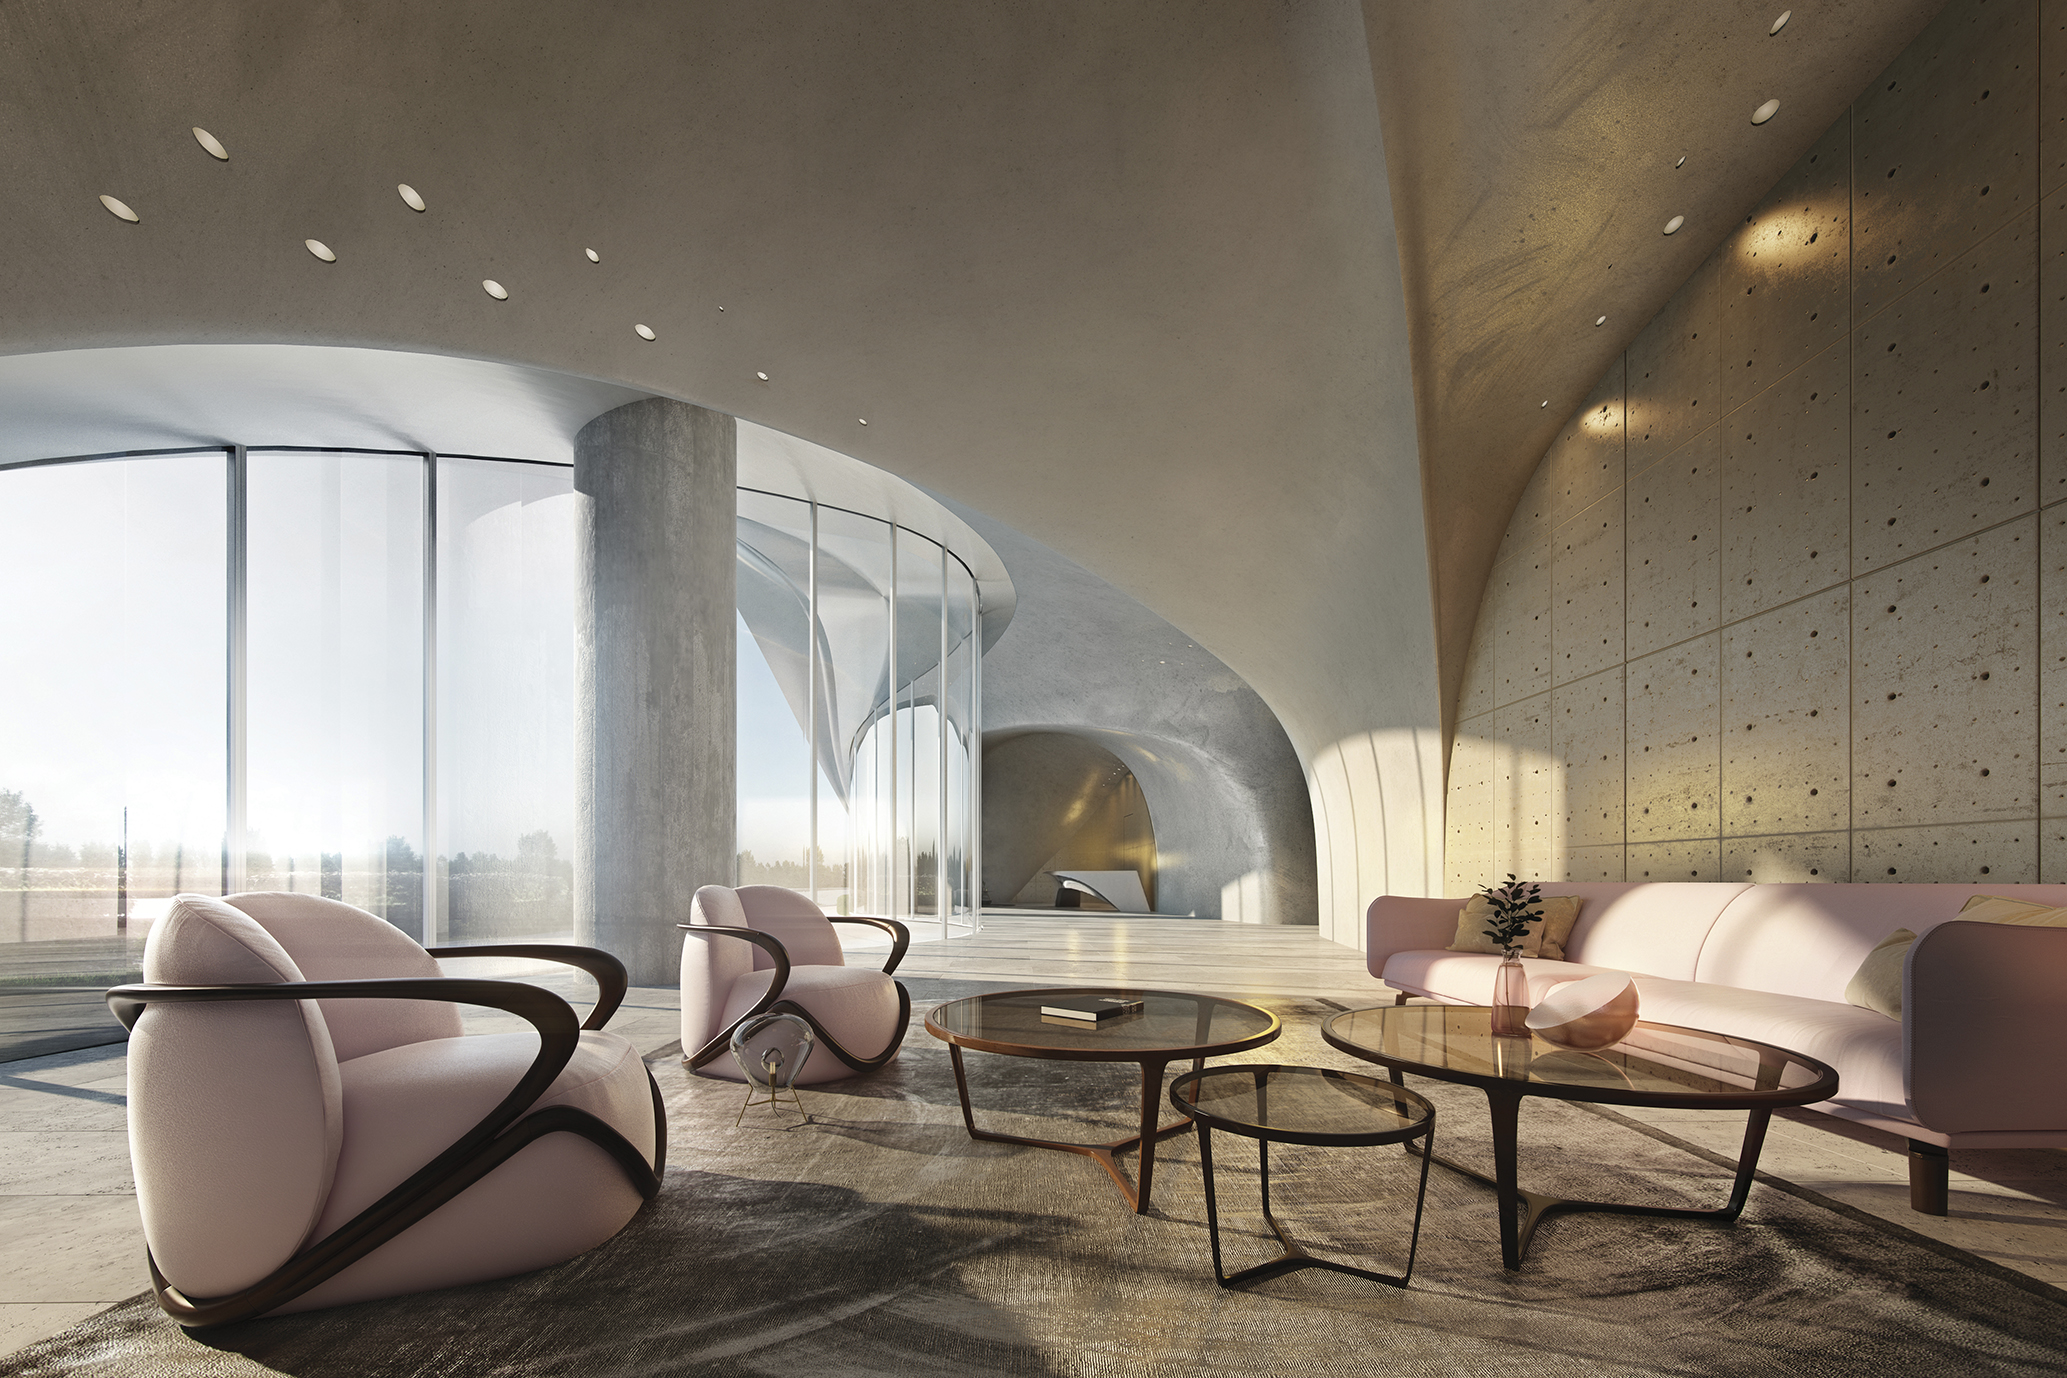 Contreras Earl Architecture - Hedges Pedestal 03